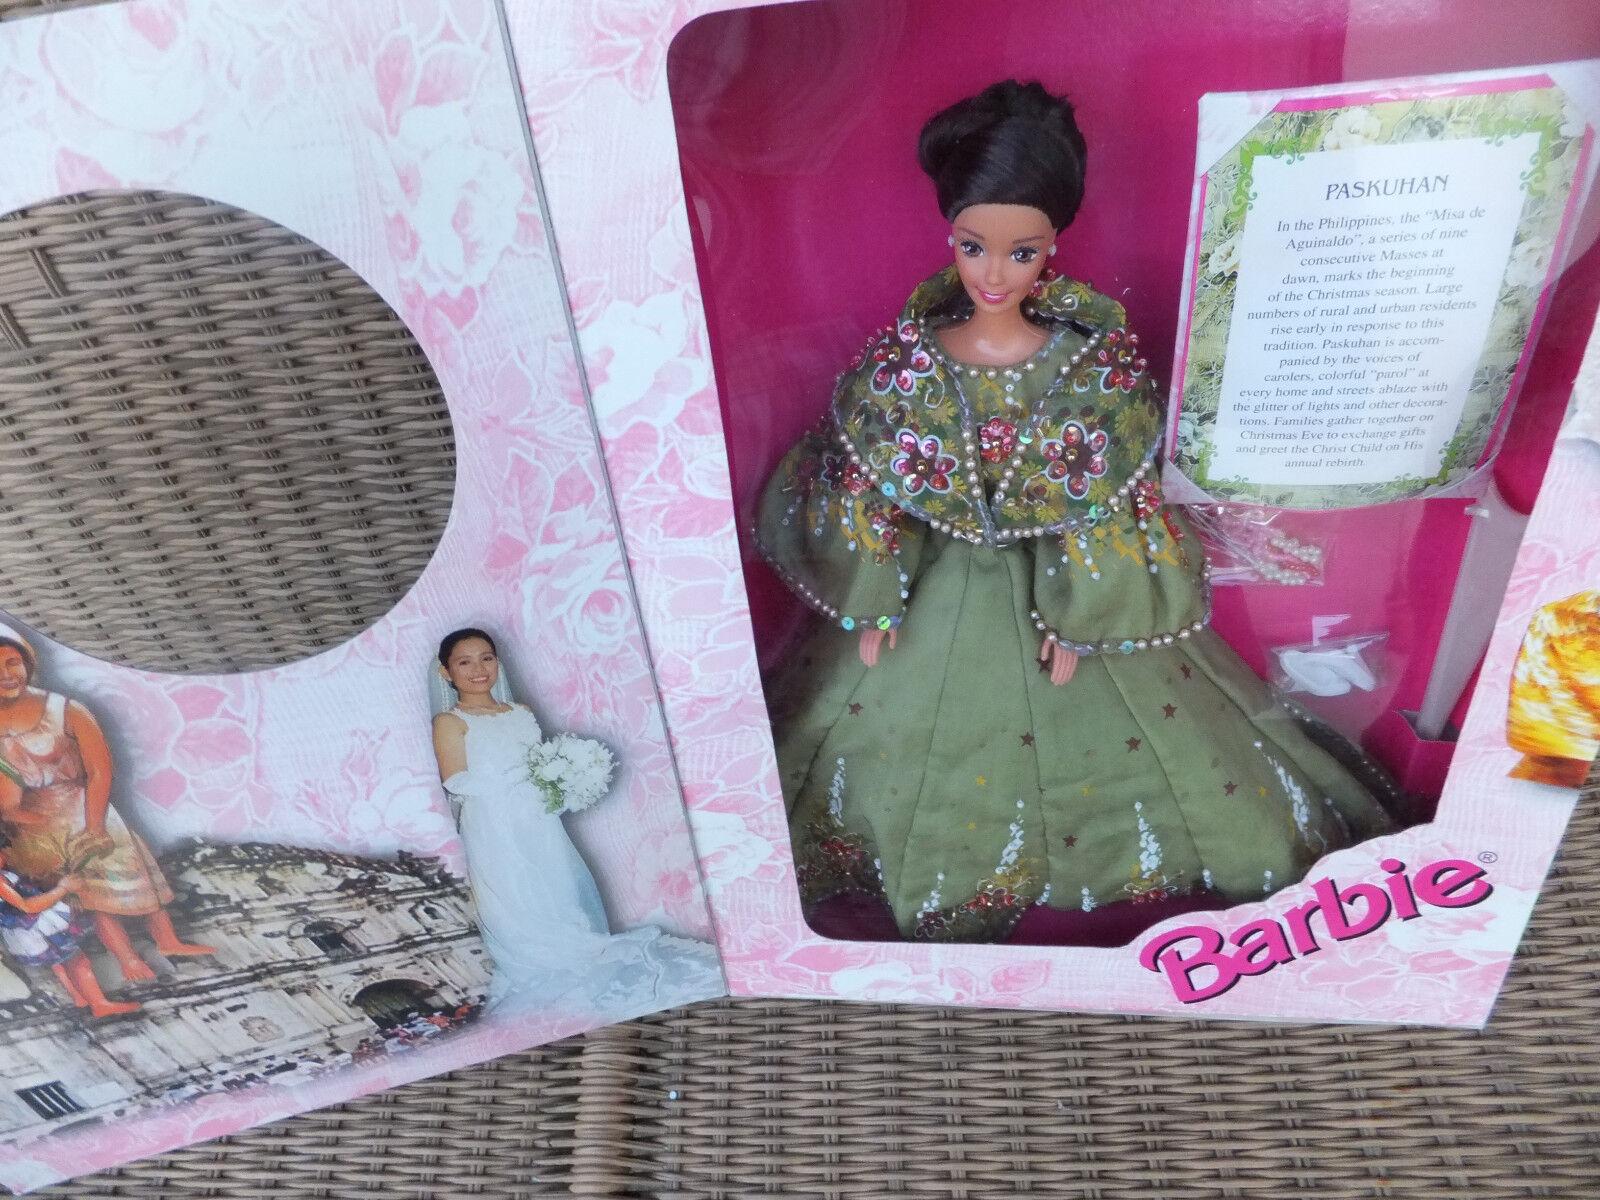 Tradisyong filipina Barbie 2000 paskuhan Edición Limitada 1000 NRFB MIB